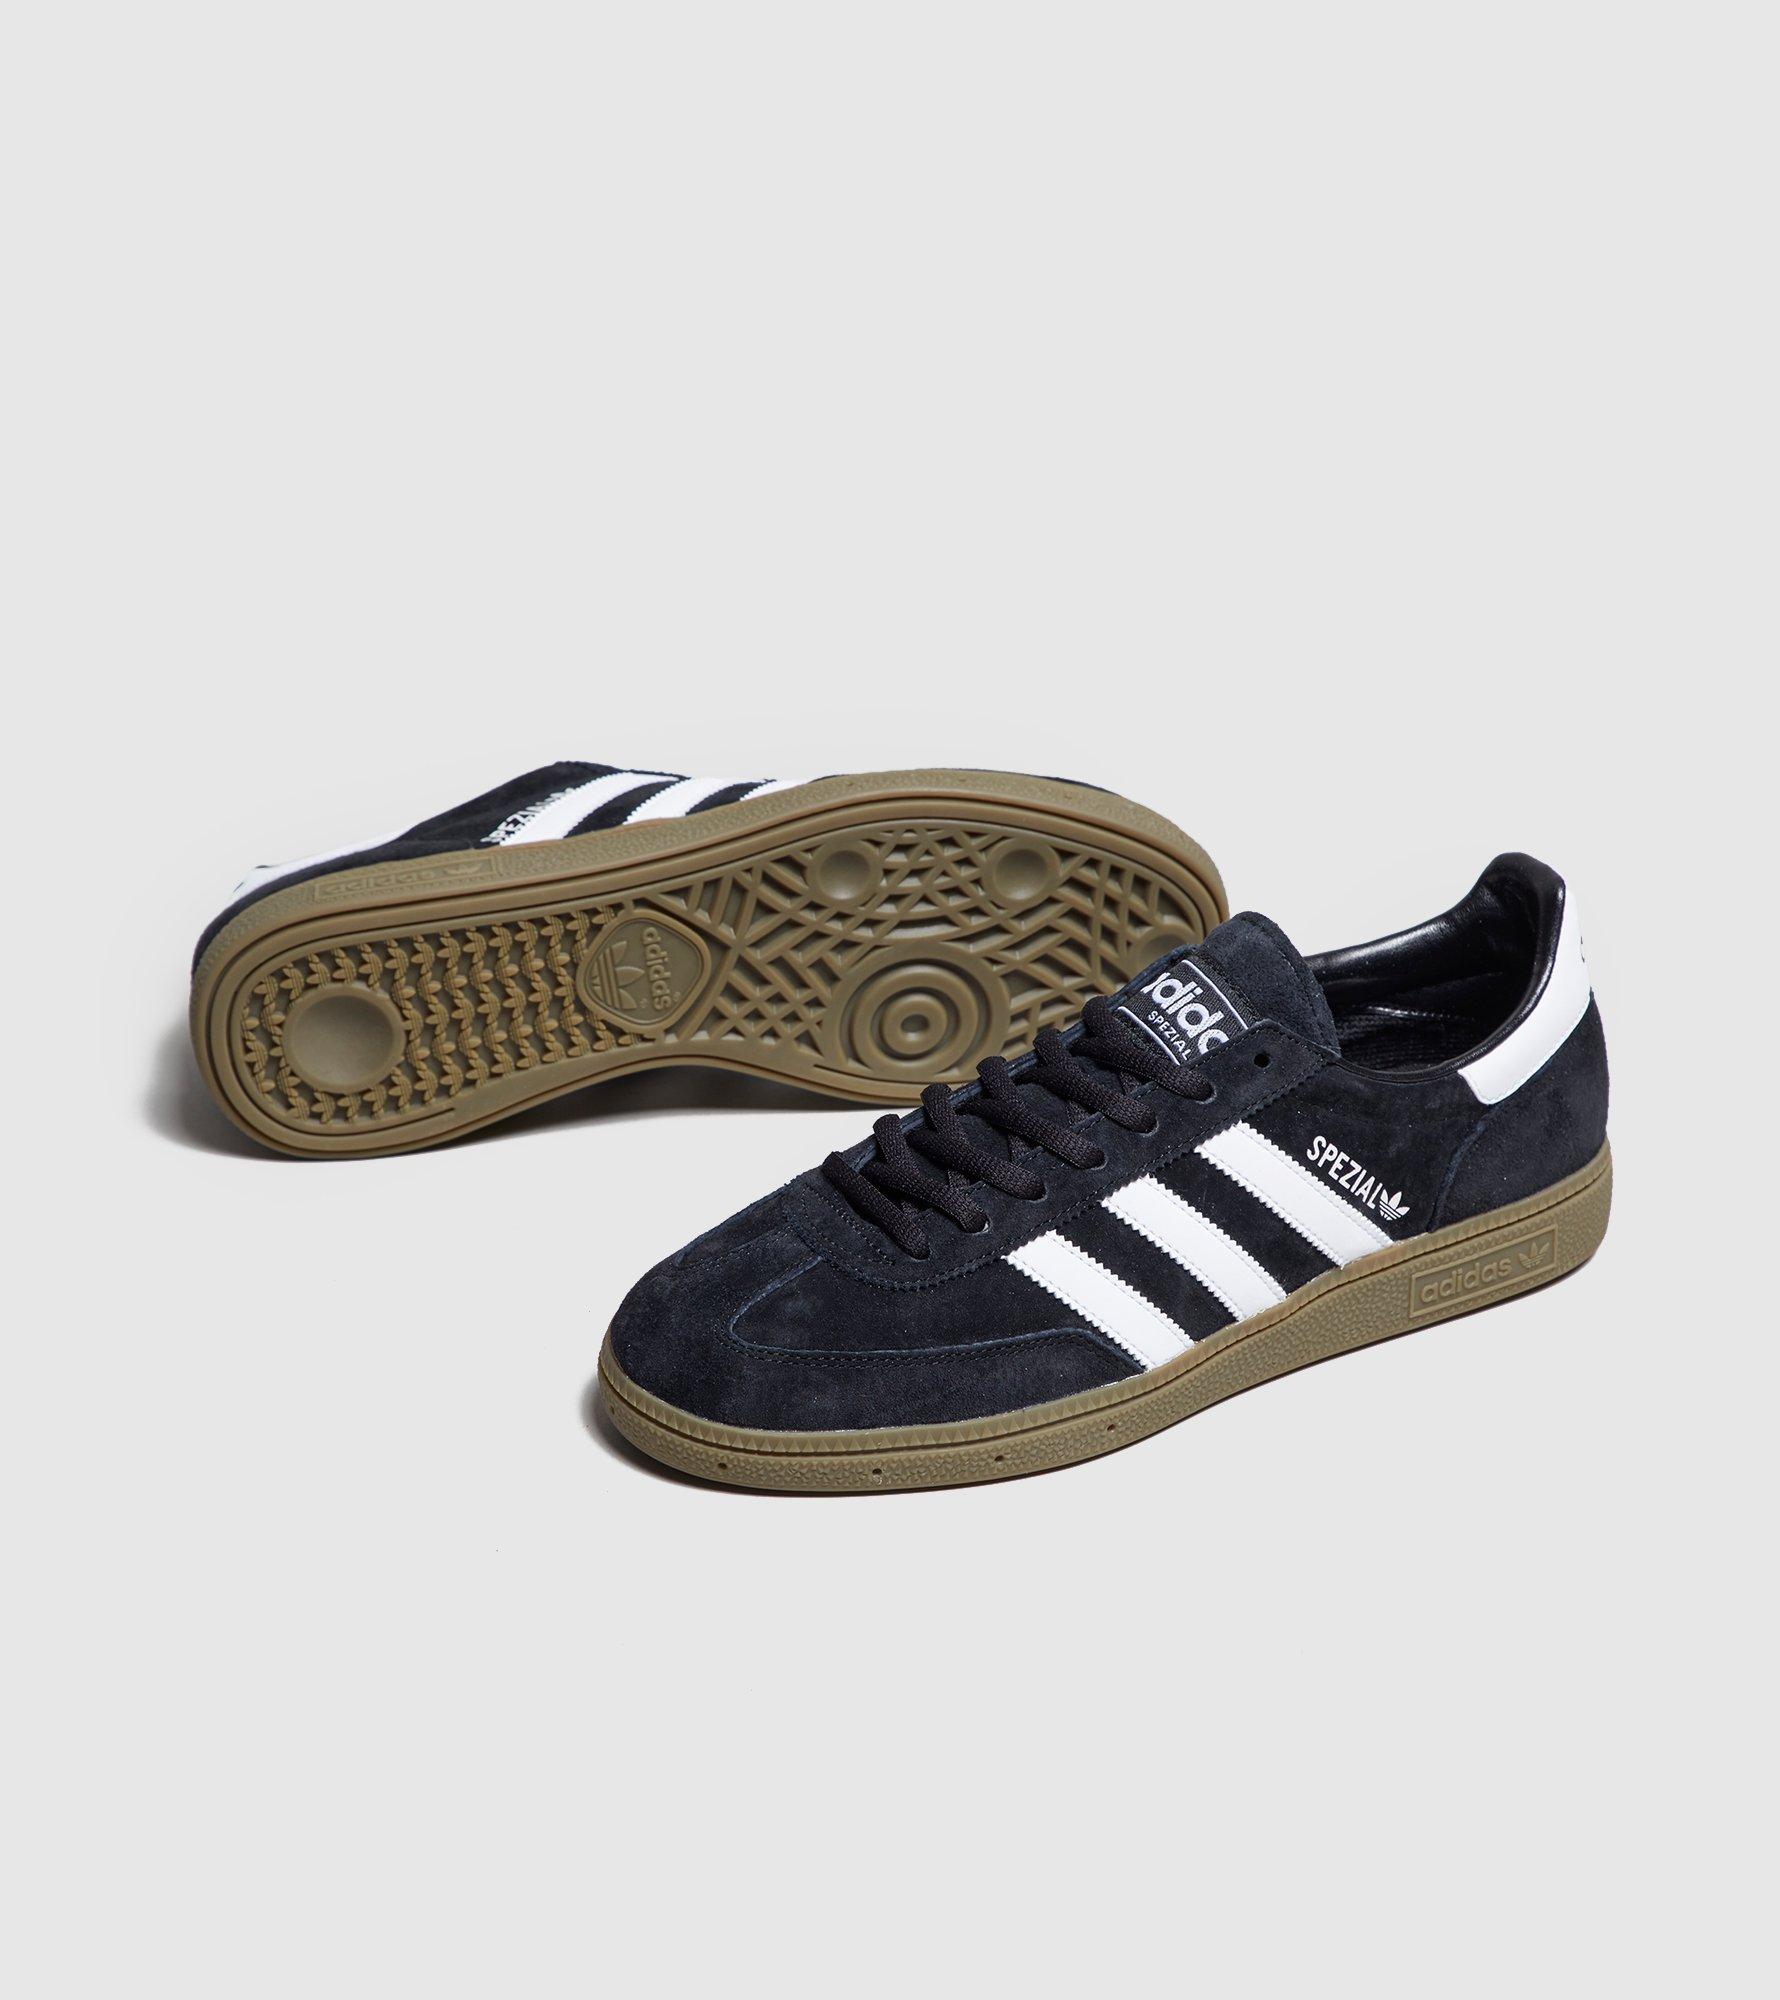 Adidas Originals Spezial Mens Trainers